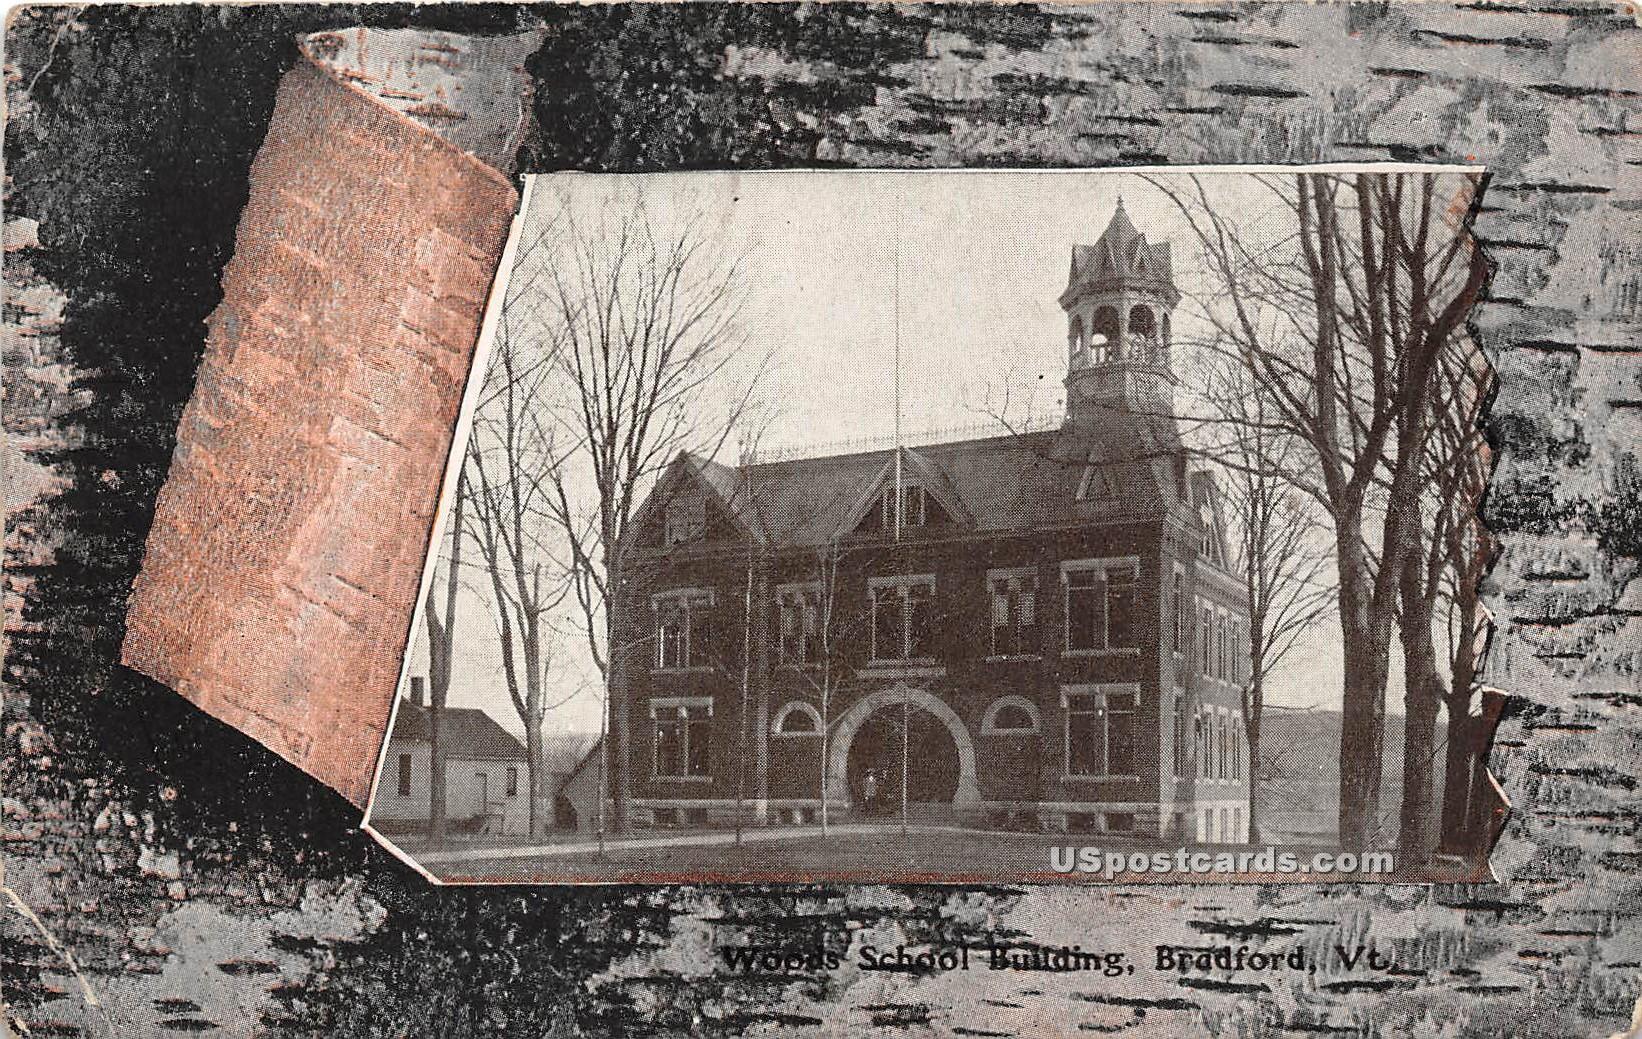 Woods School Building - Bradford, Vermont VT Postcard